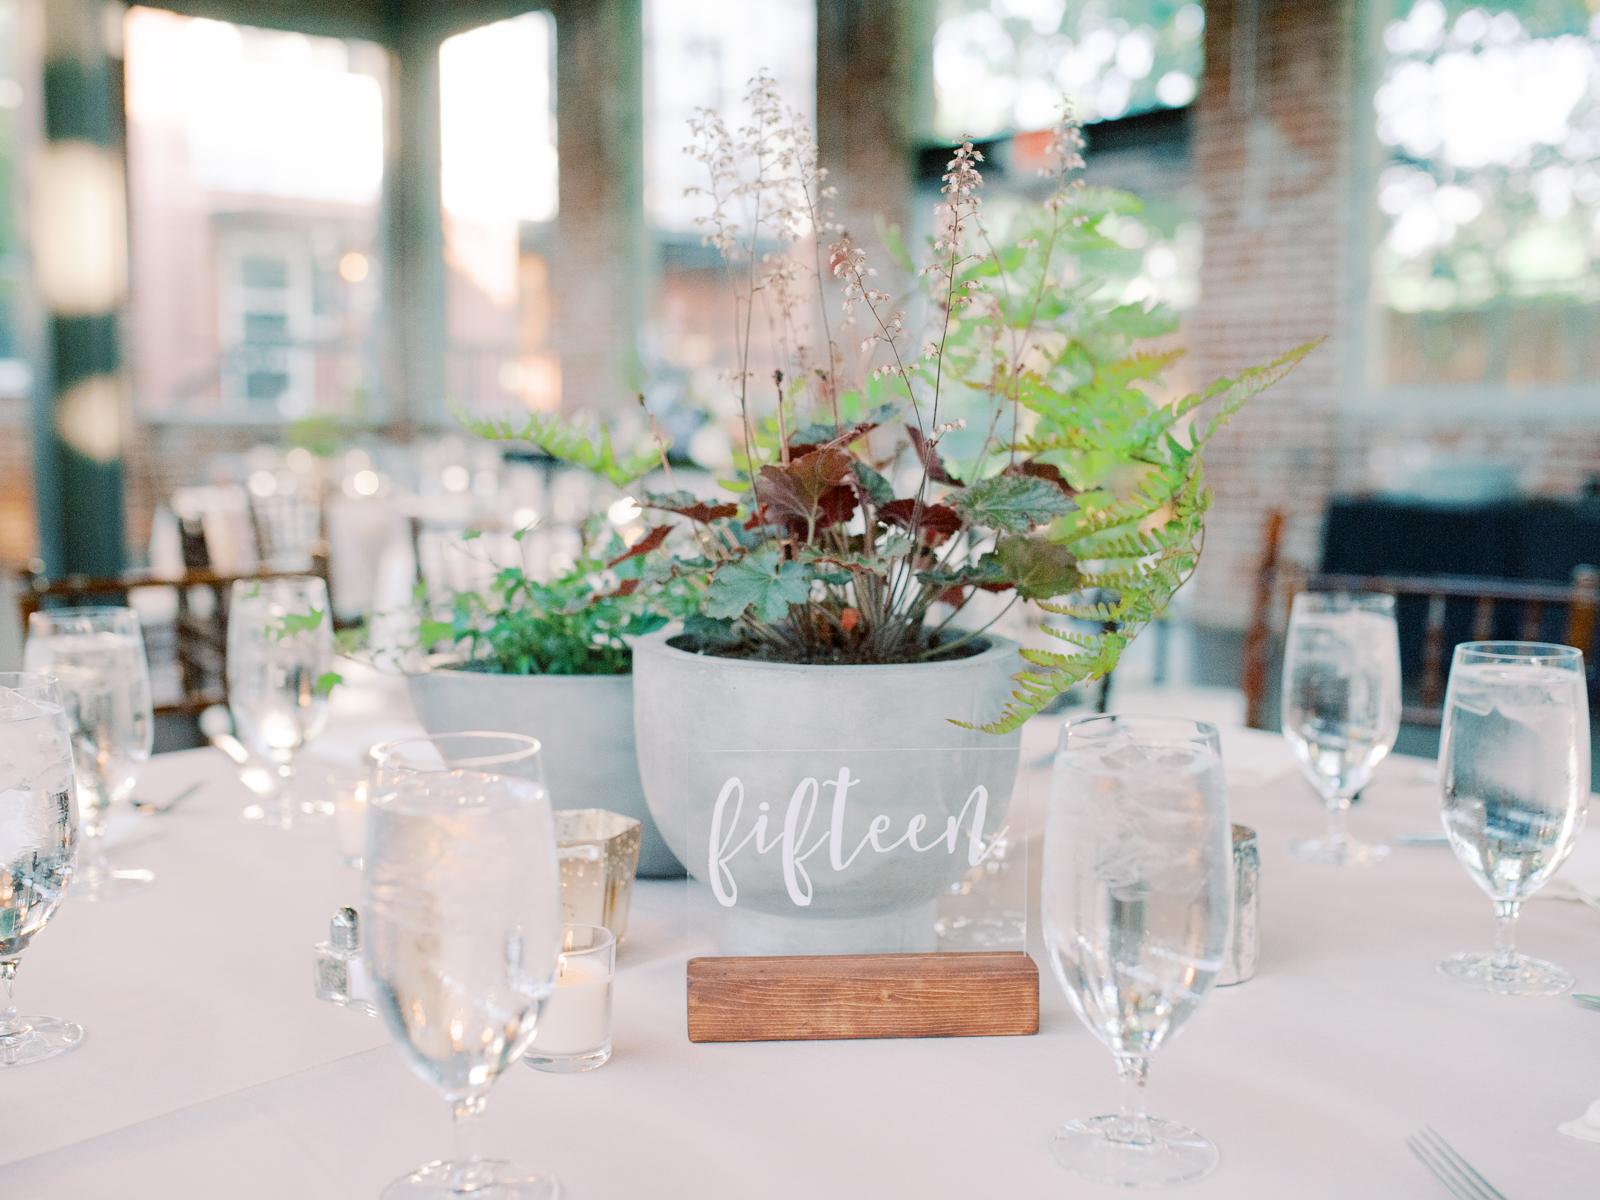 Foundry-At-Puritan-Mill-wedding-photos-venue-atlanta-fine-art-film-photographer56.JPG